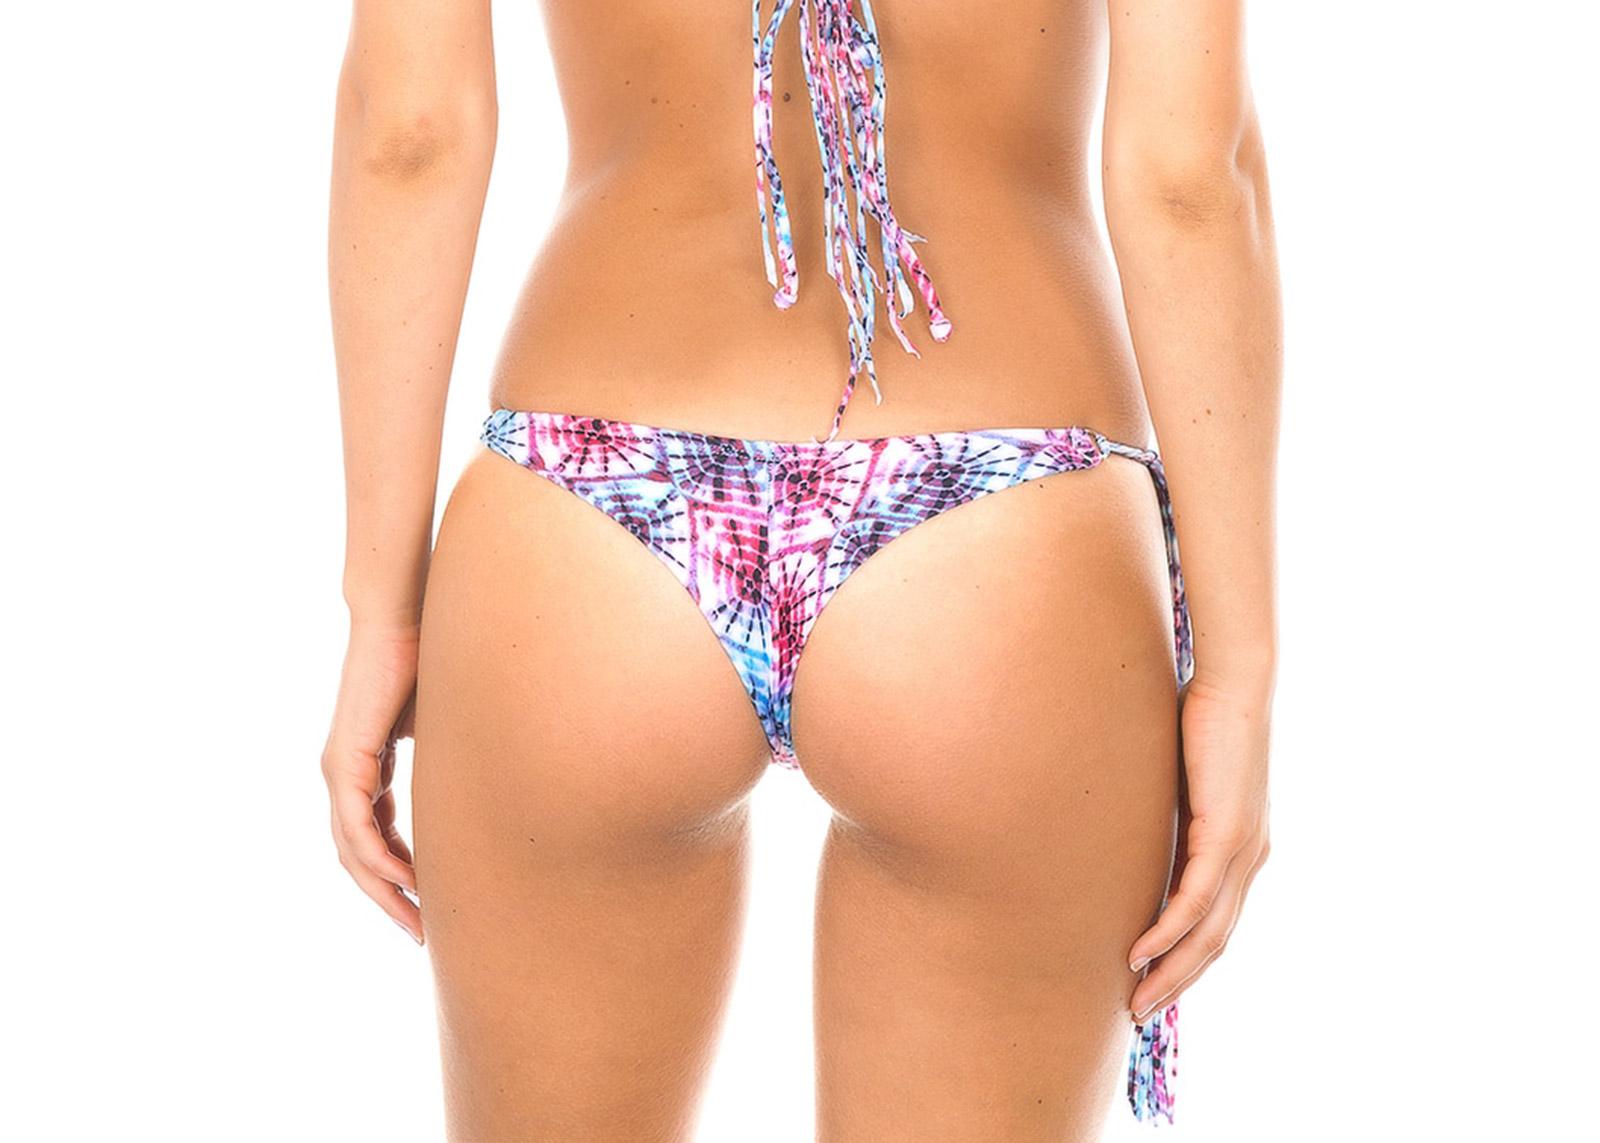 Mini bikini bottom